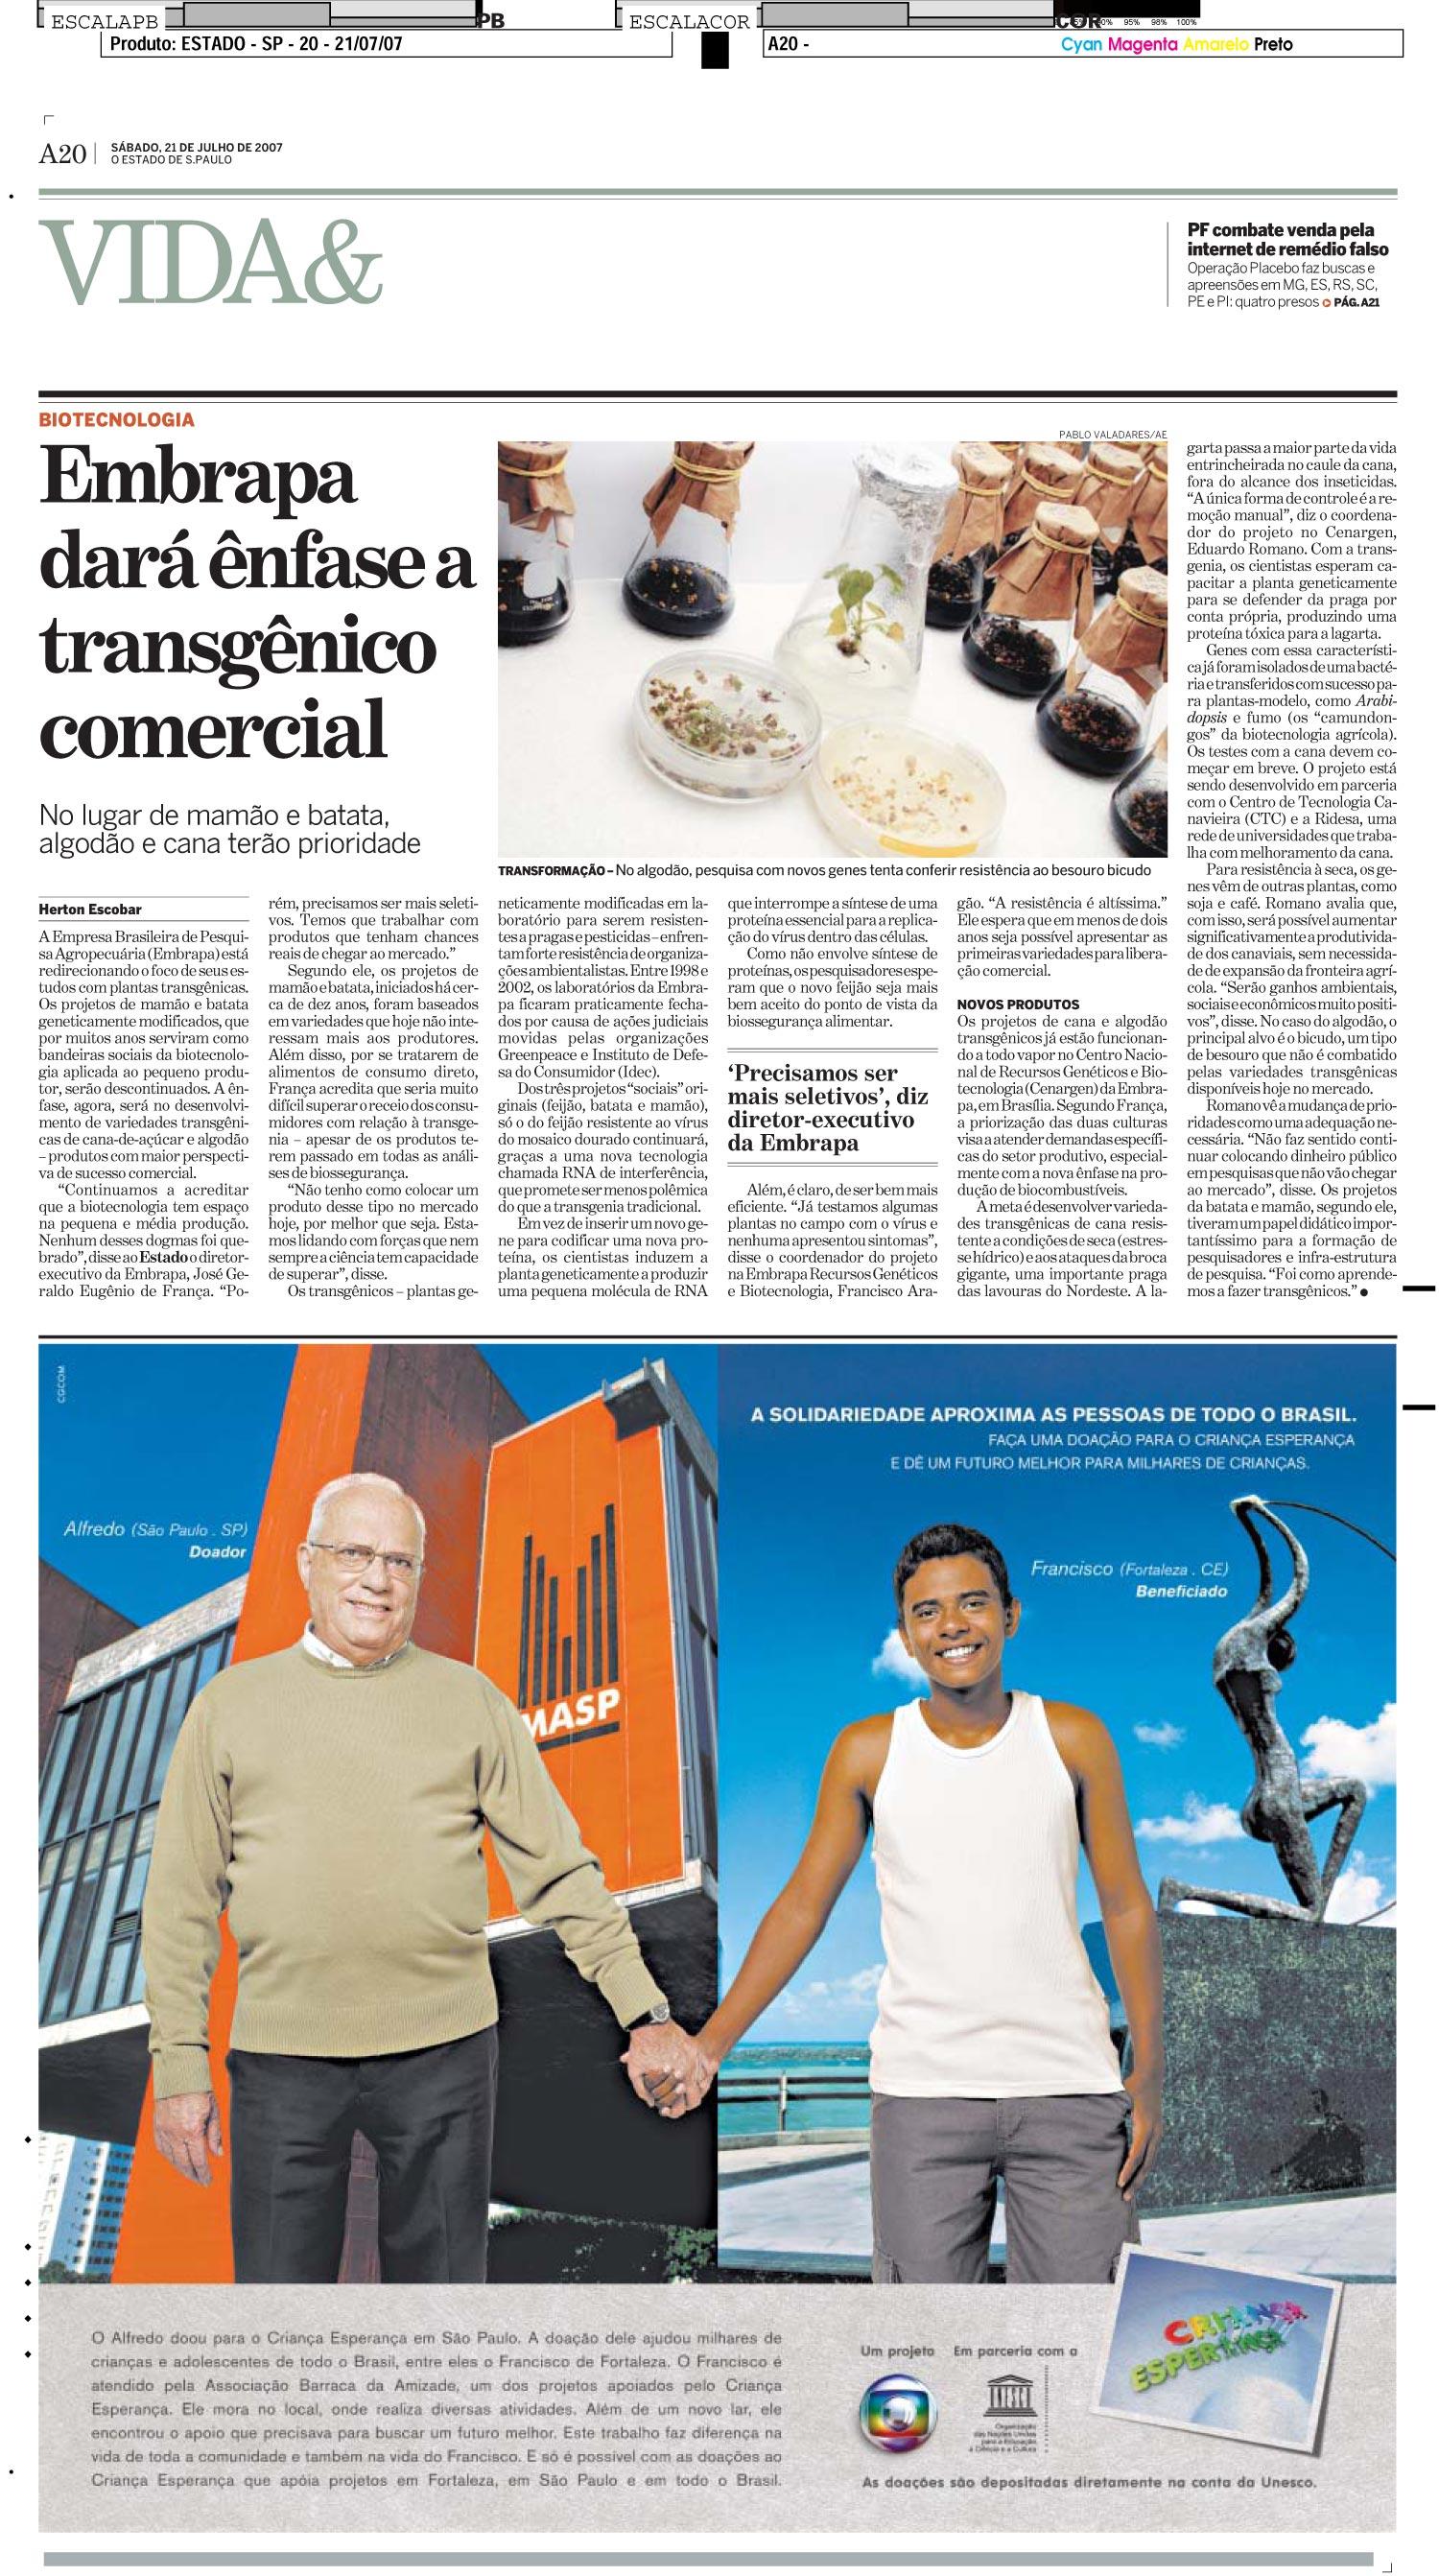 Embrapa dará ênfase a transgênico comercial